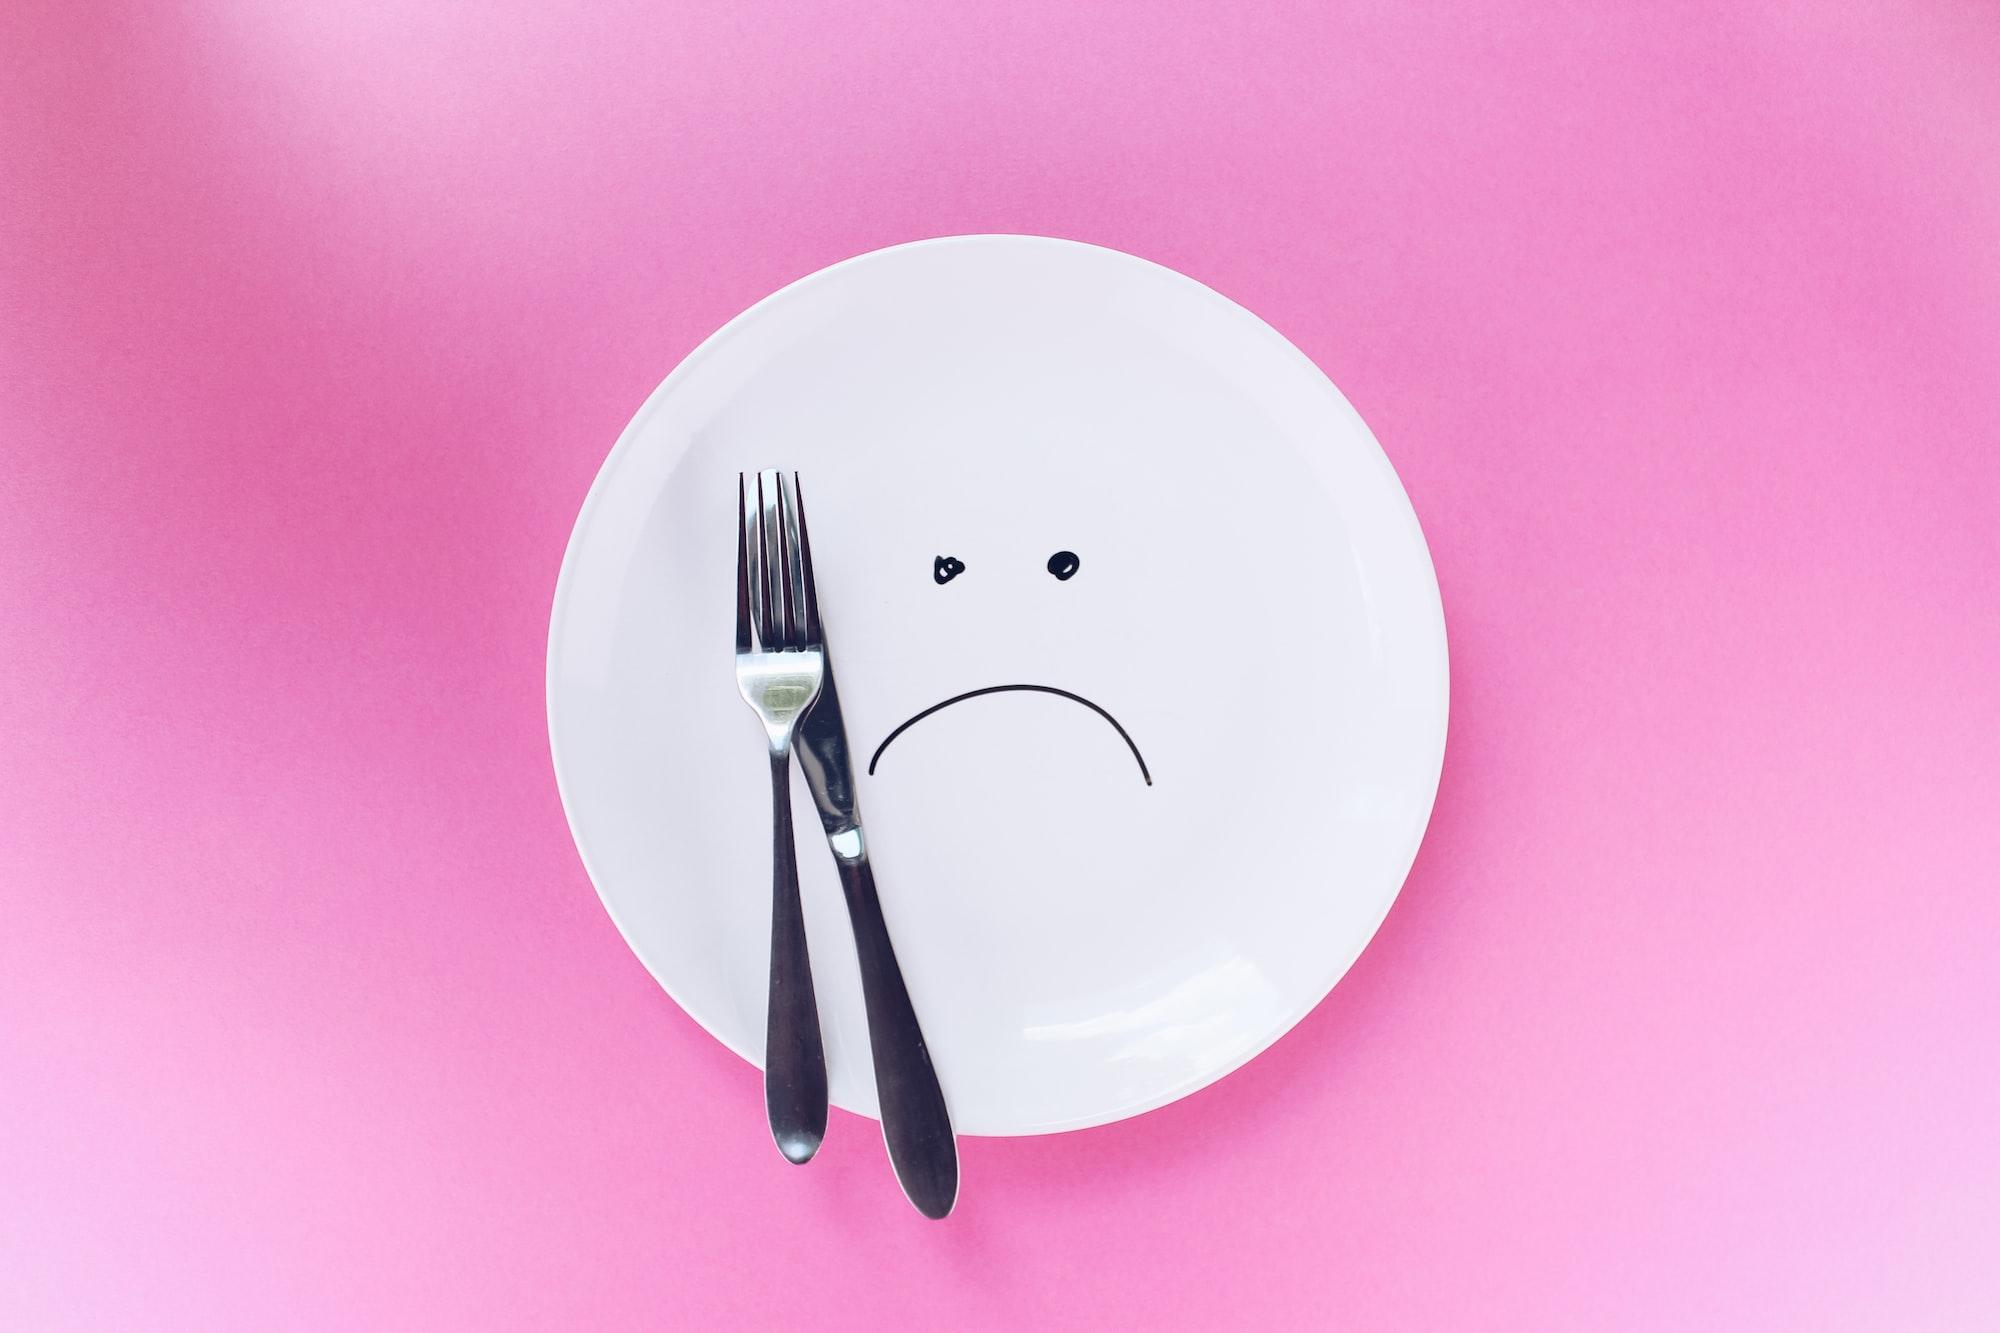 alegoria alimentar